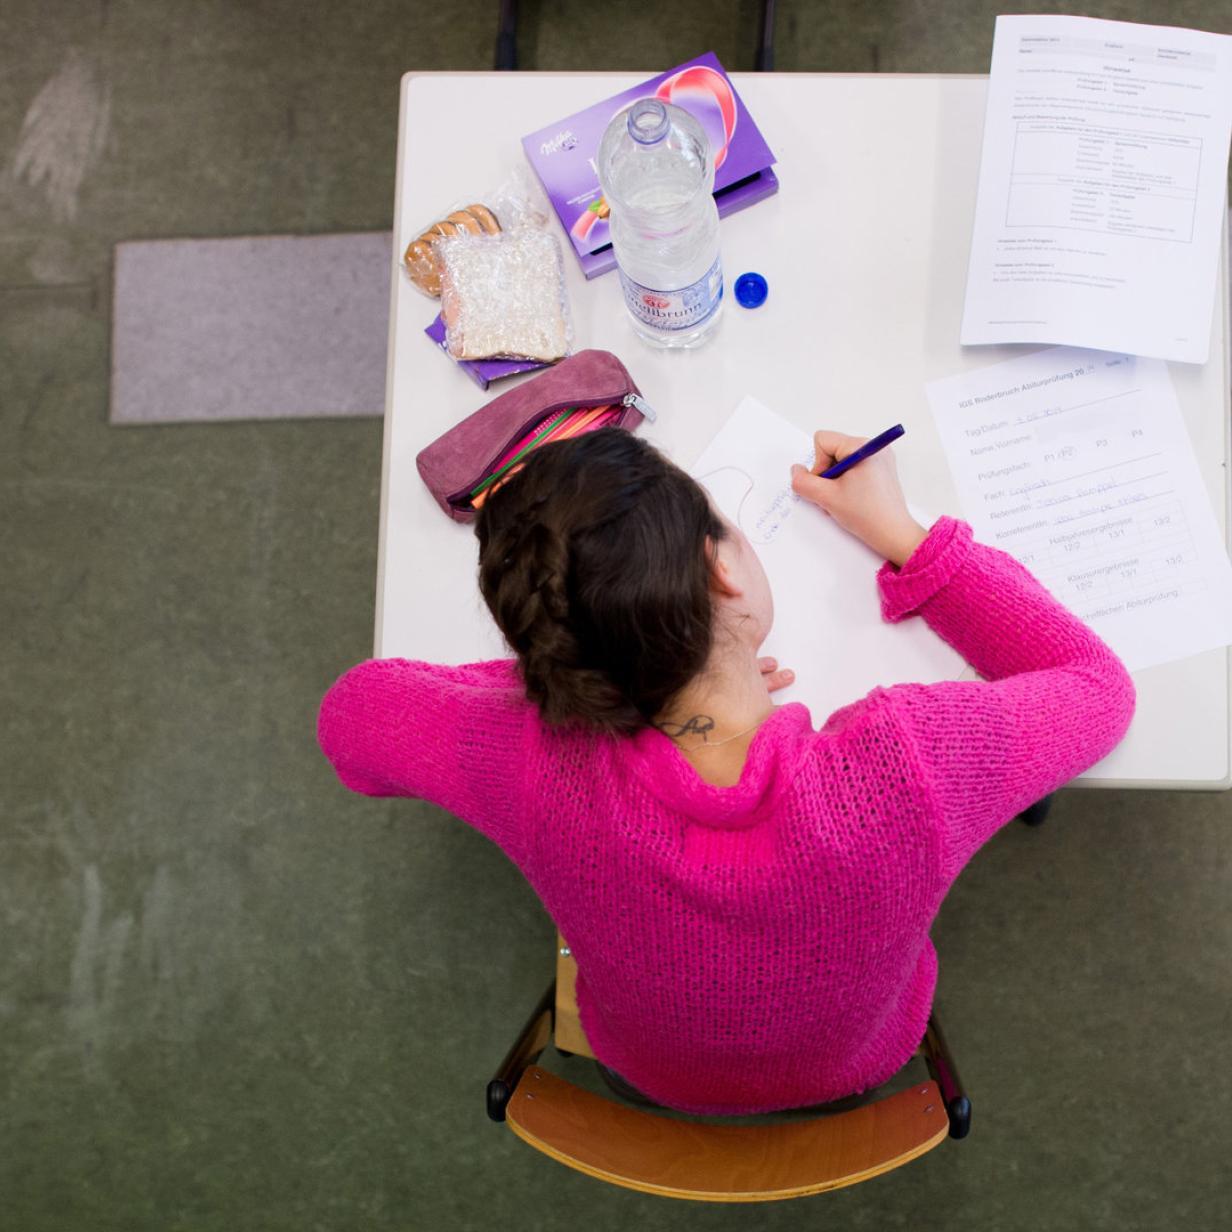 Mathe-Matura: Nur noch jeder neunte AHS-Schüler hat Fünfer